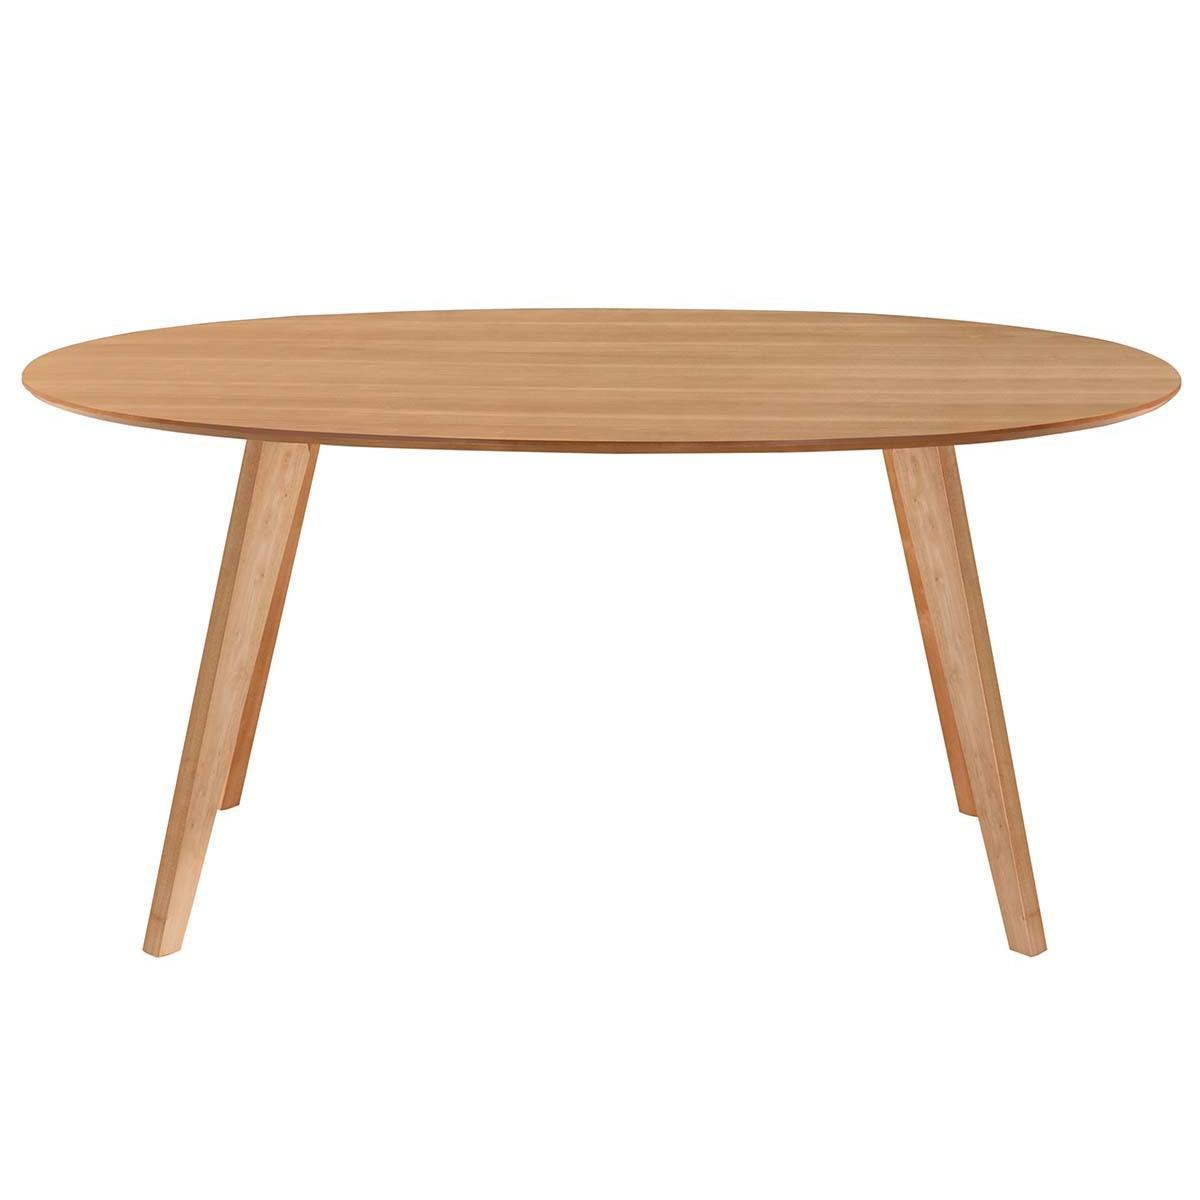 Miliboo Table à manger design scandinave ovale chêne L160 cm MARIK